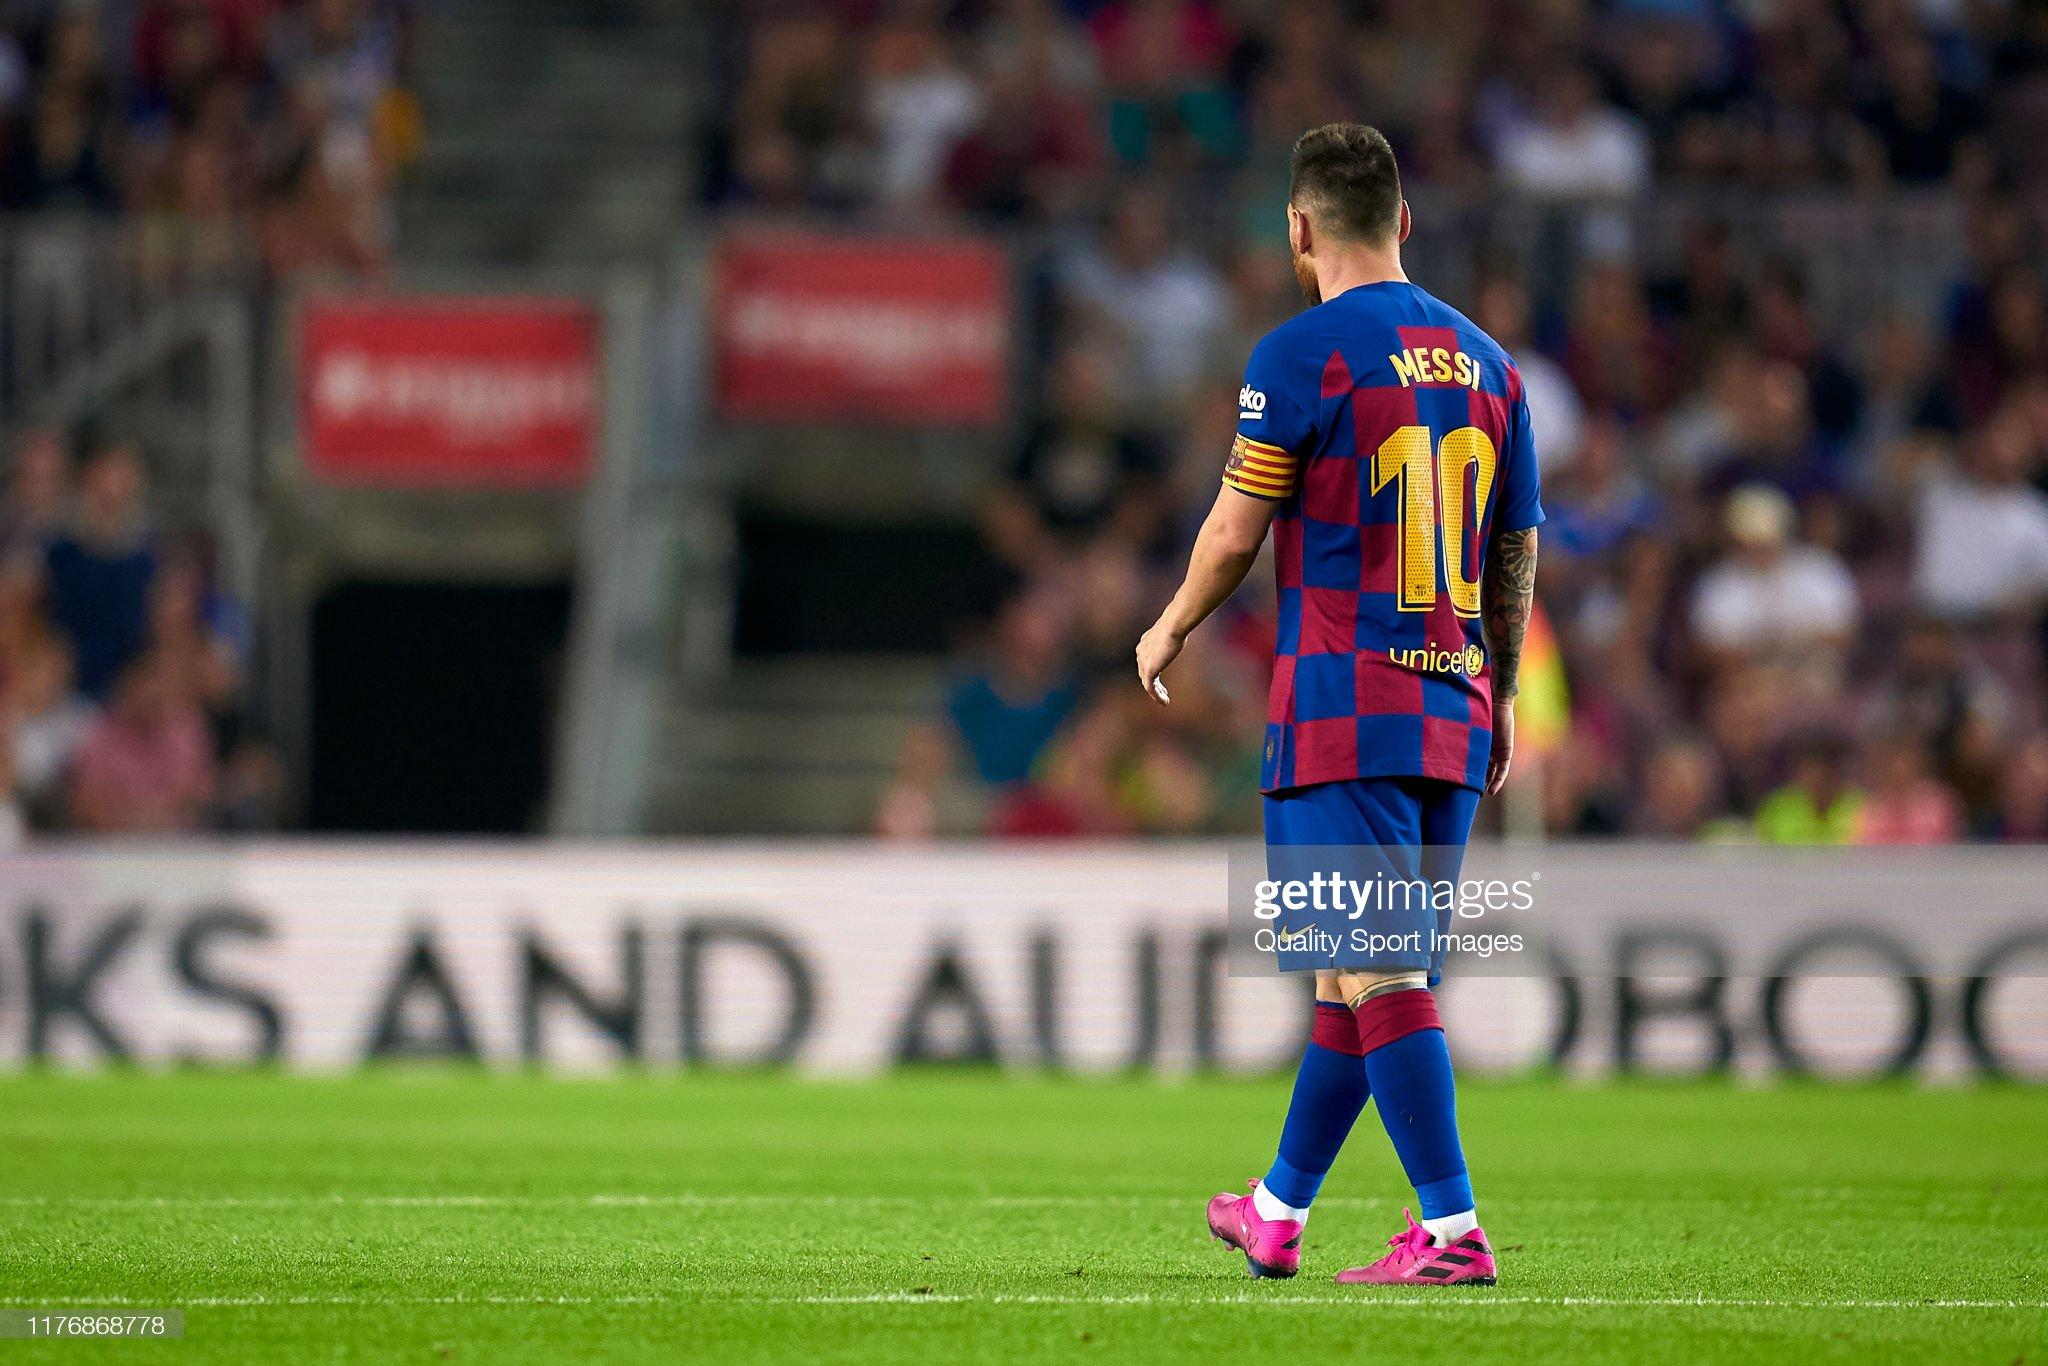 صور مباراة : برشلونة - فياريال 2-1 ( 24-09-2019 )  Lionel-messi-of-fc-barcelona-looks-on-during-the-liga-match-between-picture-id1176868778?s=2048x2048